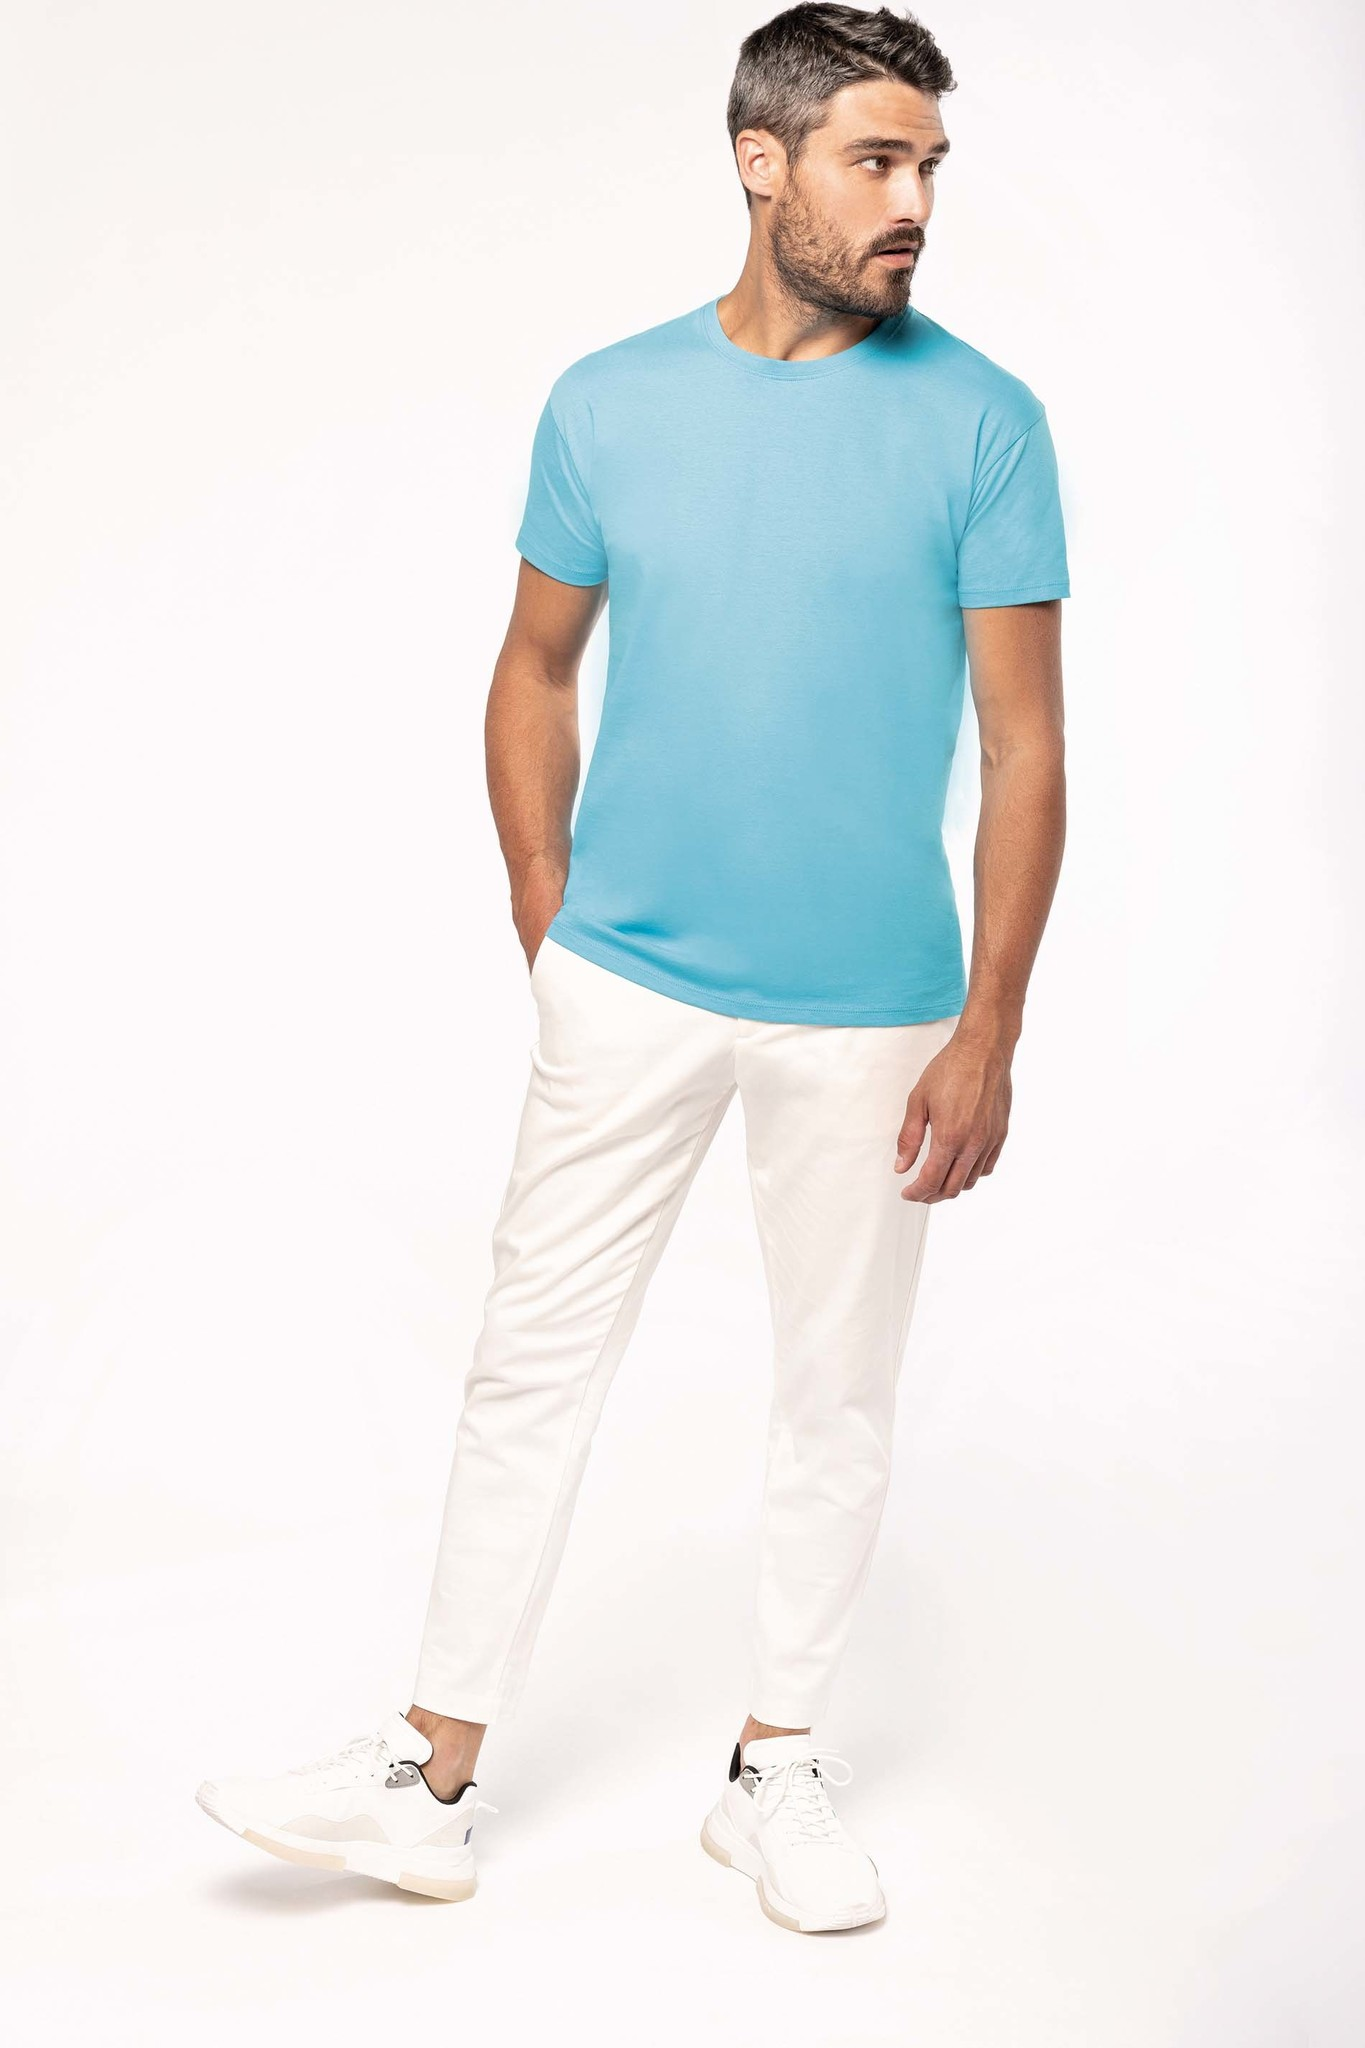 Eco-Friendly Unisex T-shirt - Terracotta Red